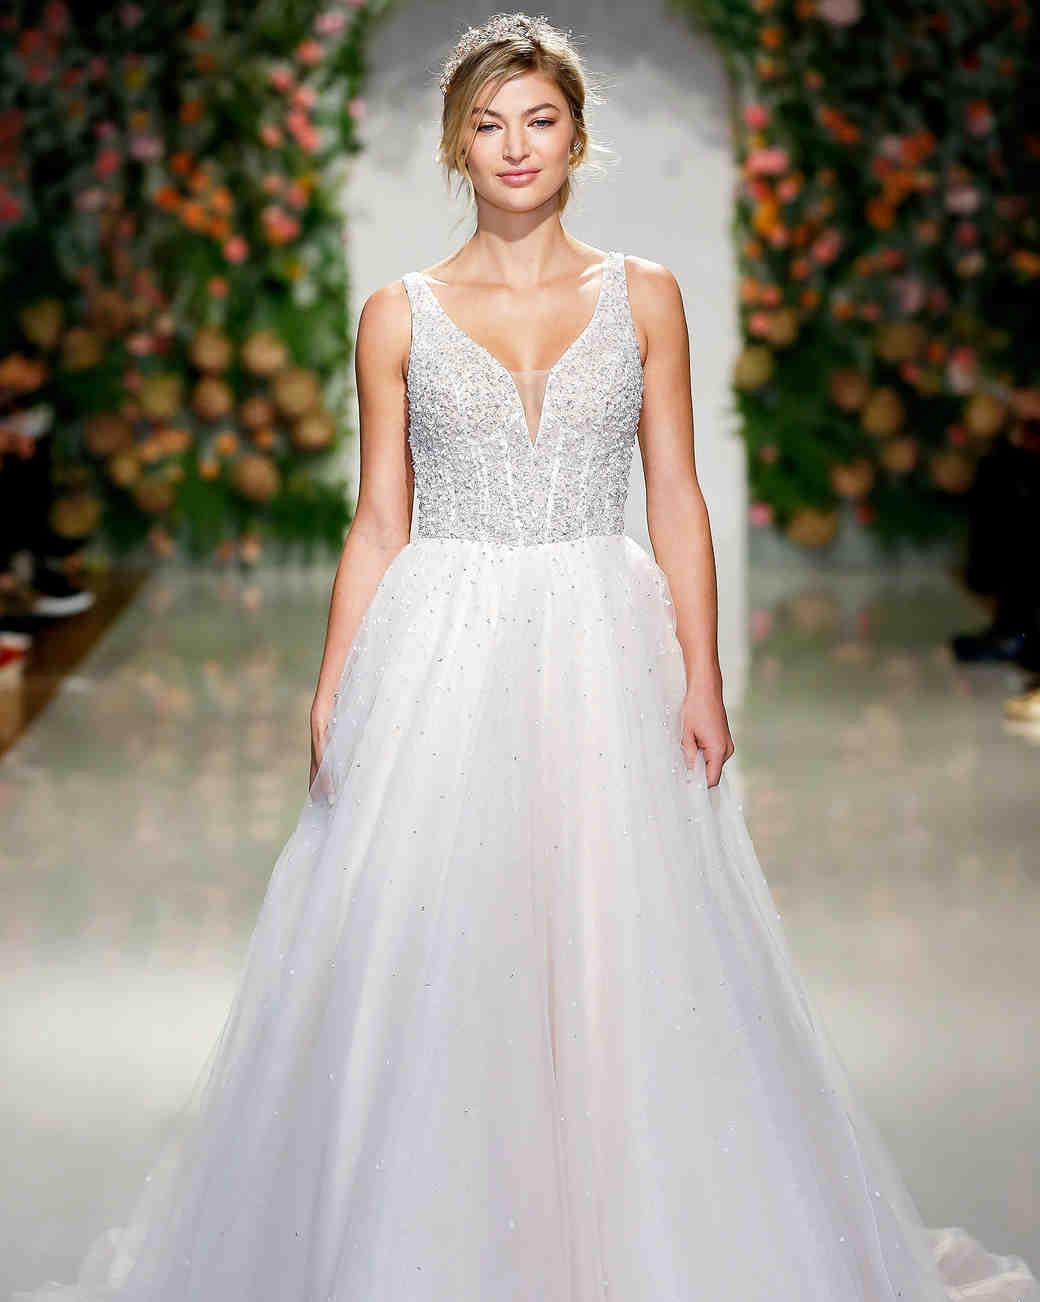 morilee madeline gardner wedding dress ball gown with beaded bodice